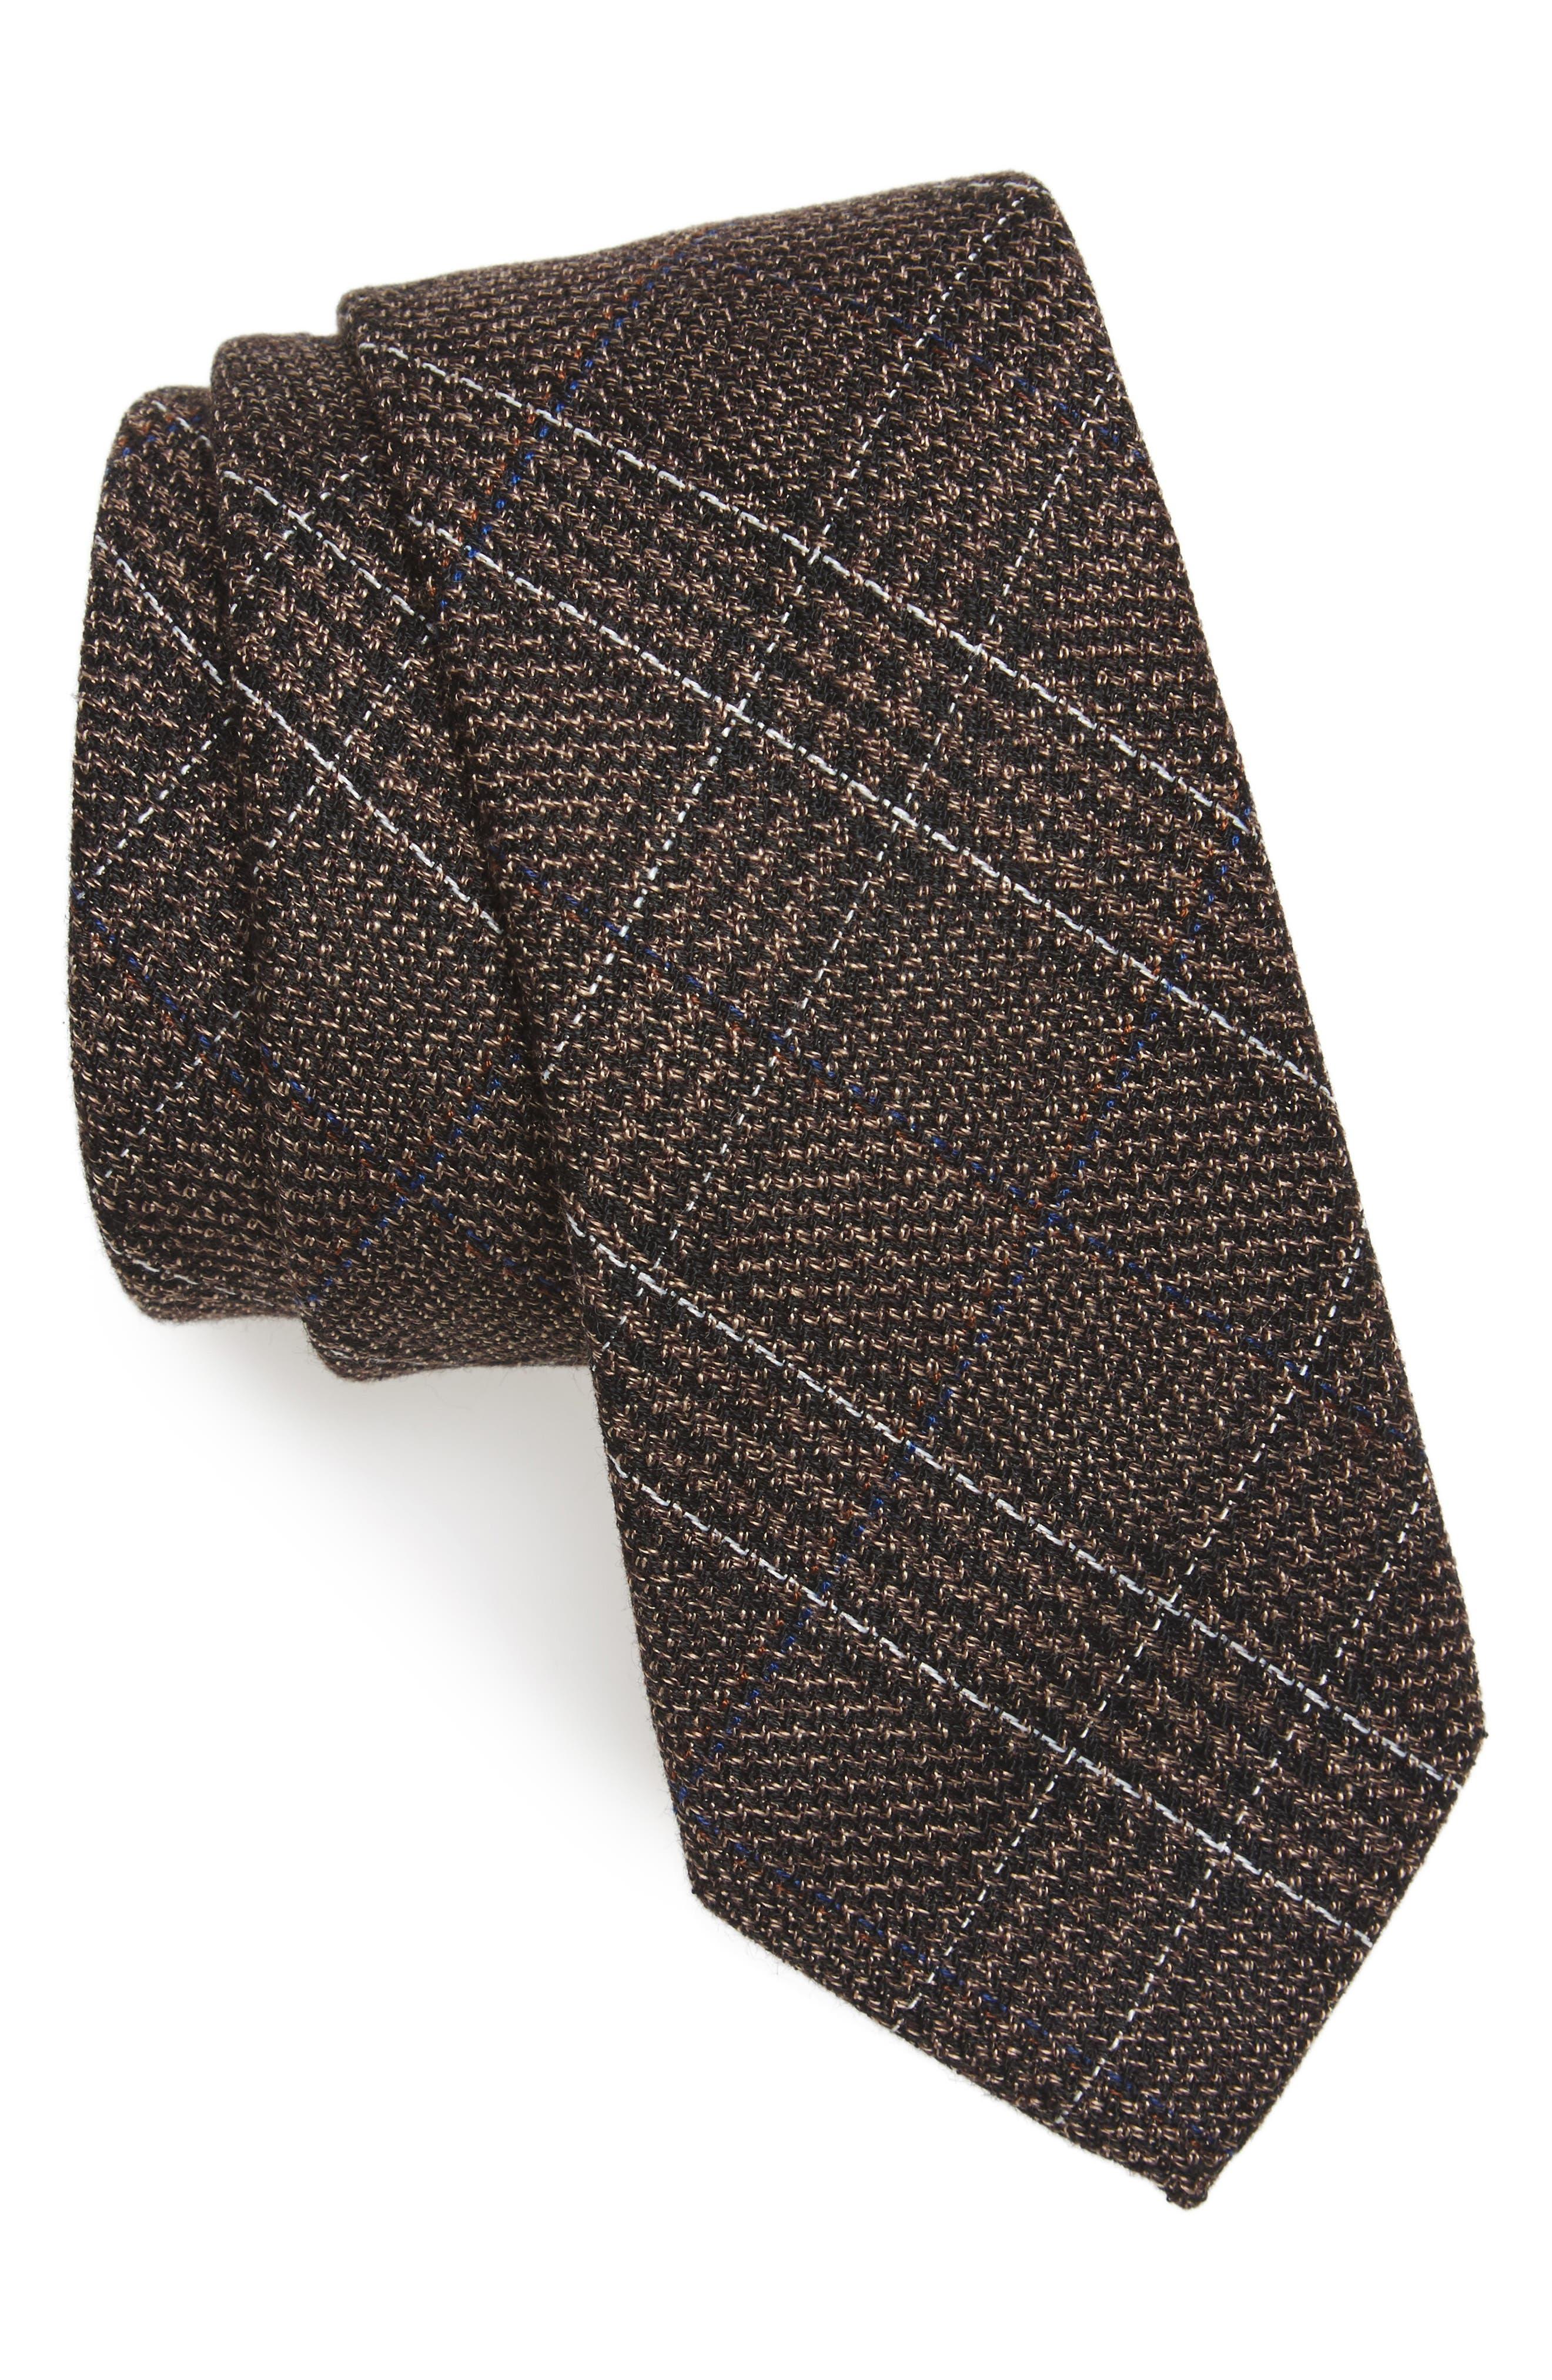 Main Image - Nordstrom Men's Shop Eastview Check Skinny Tie